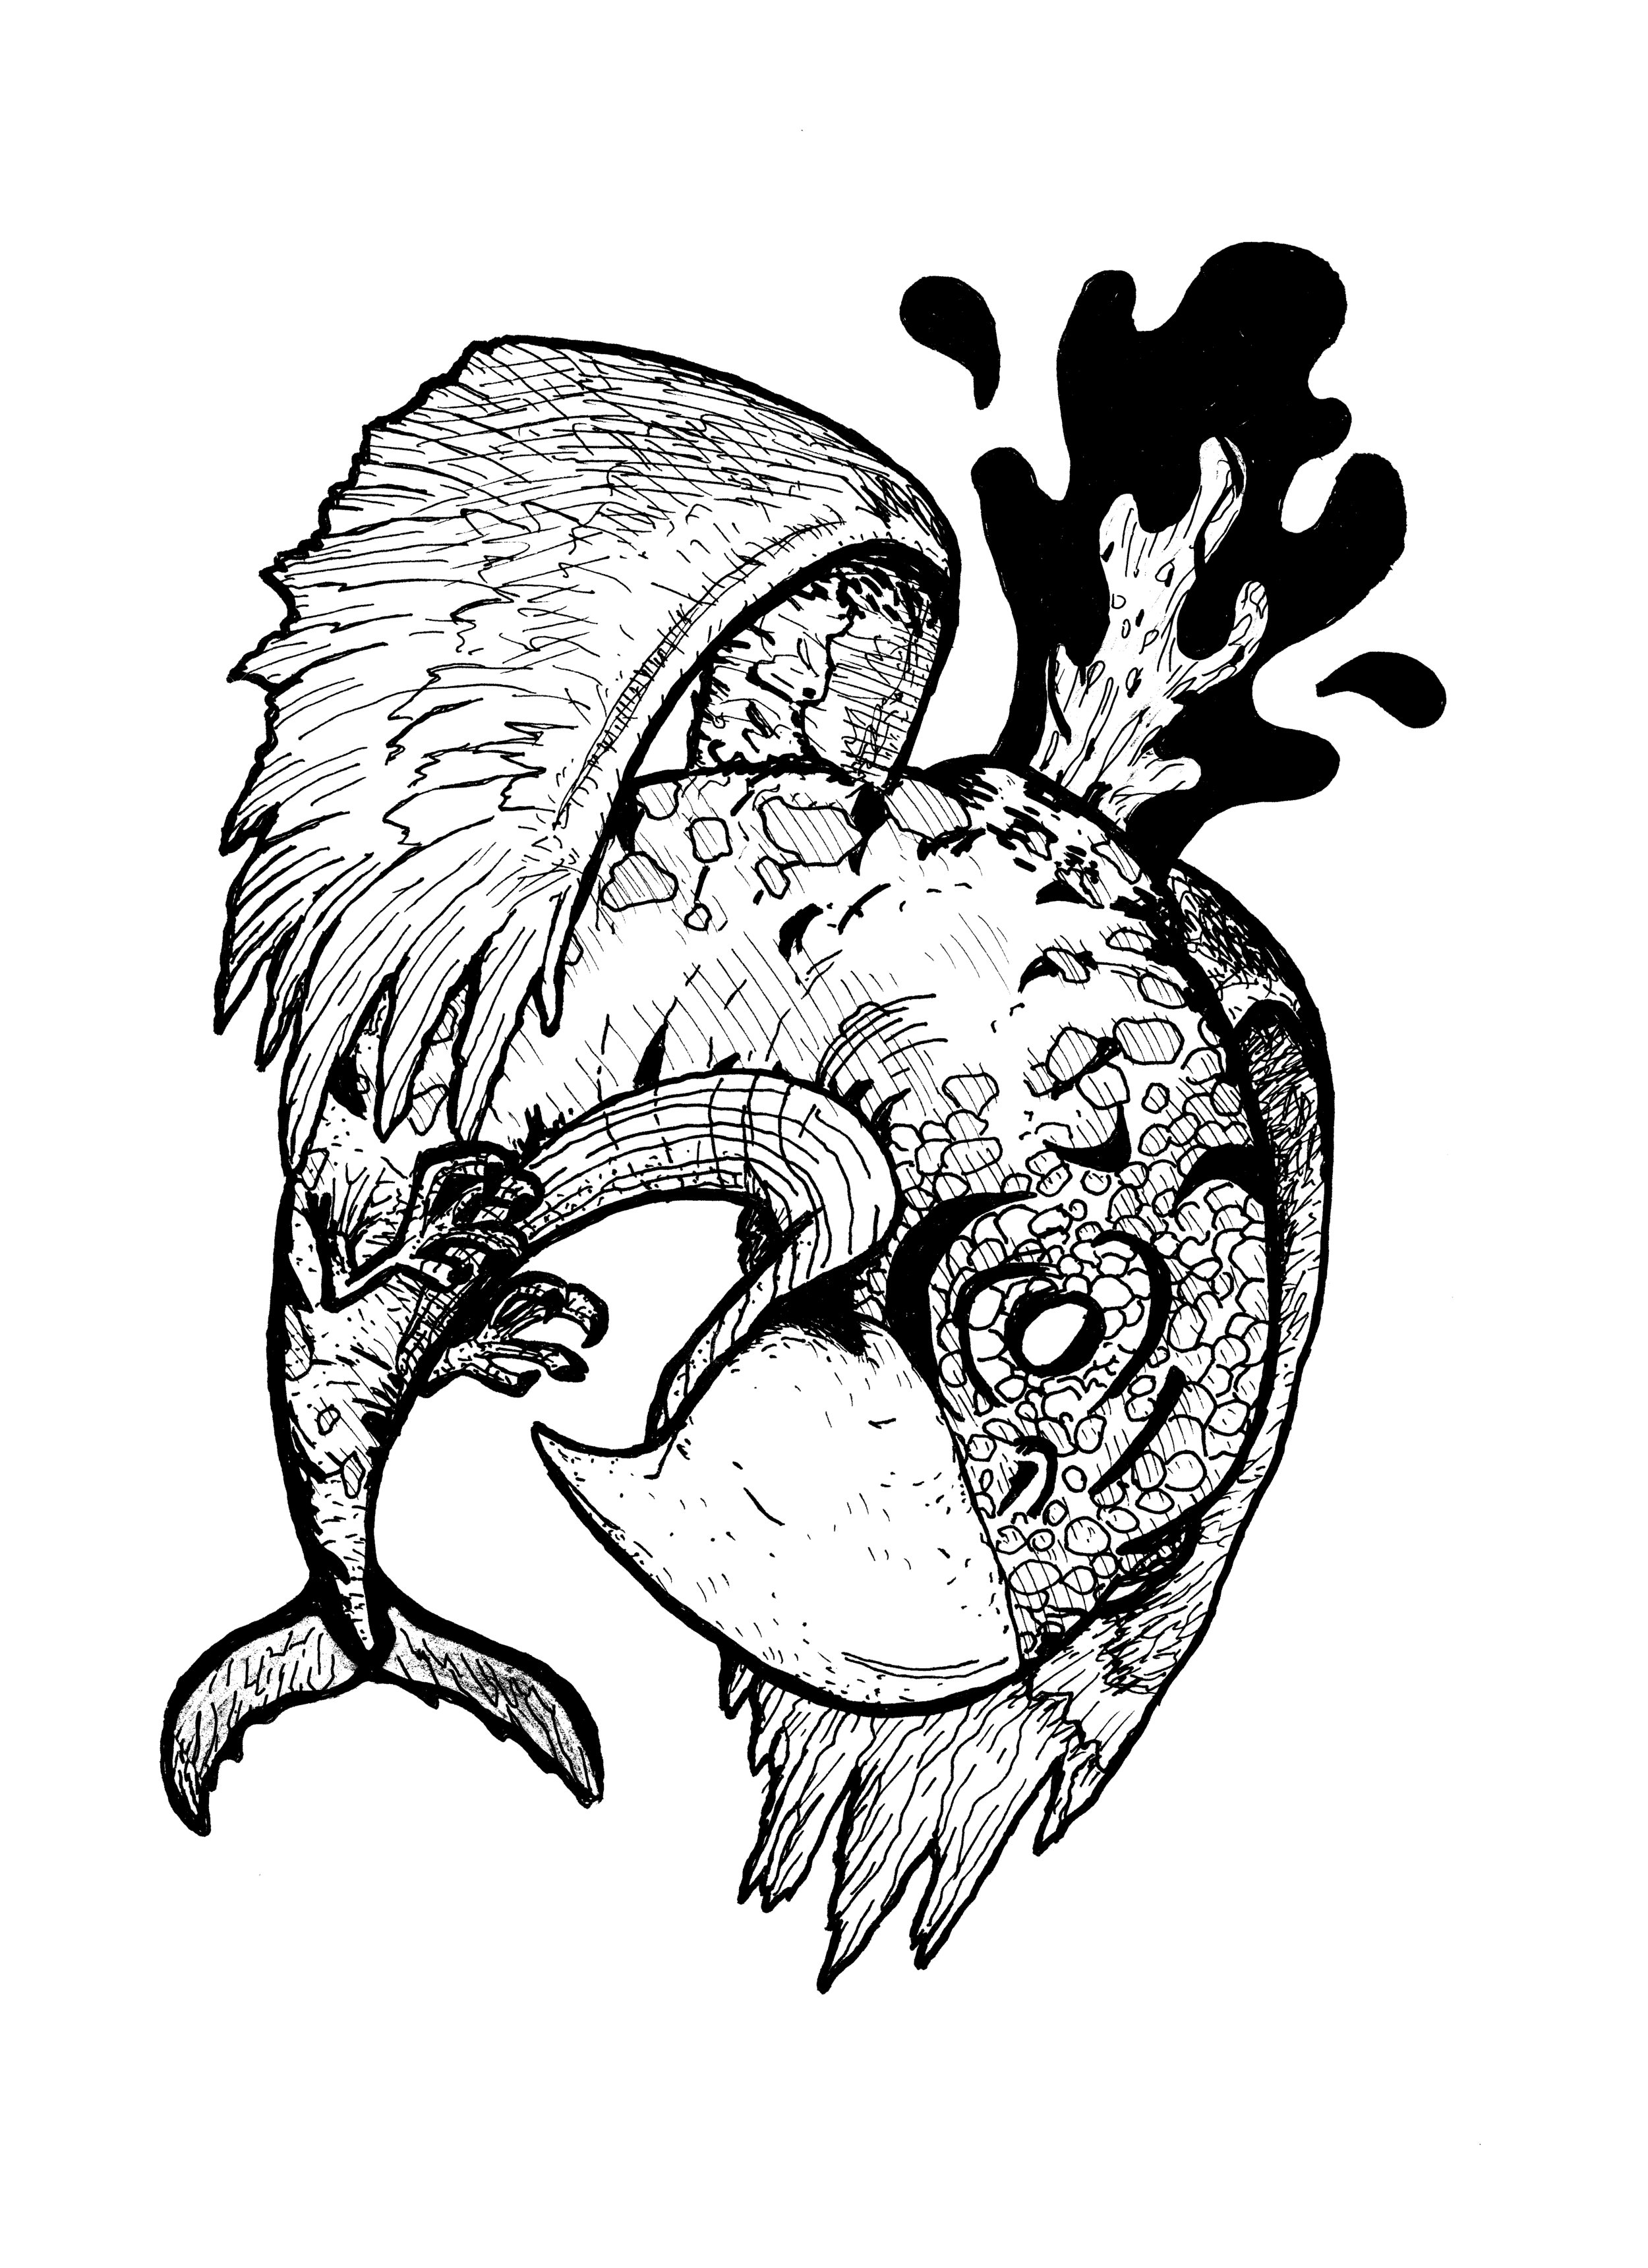 vulturewhaleALUMINIUMdrawingBYjoeyOriginal.png